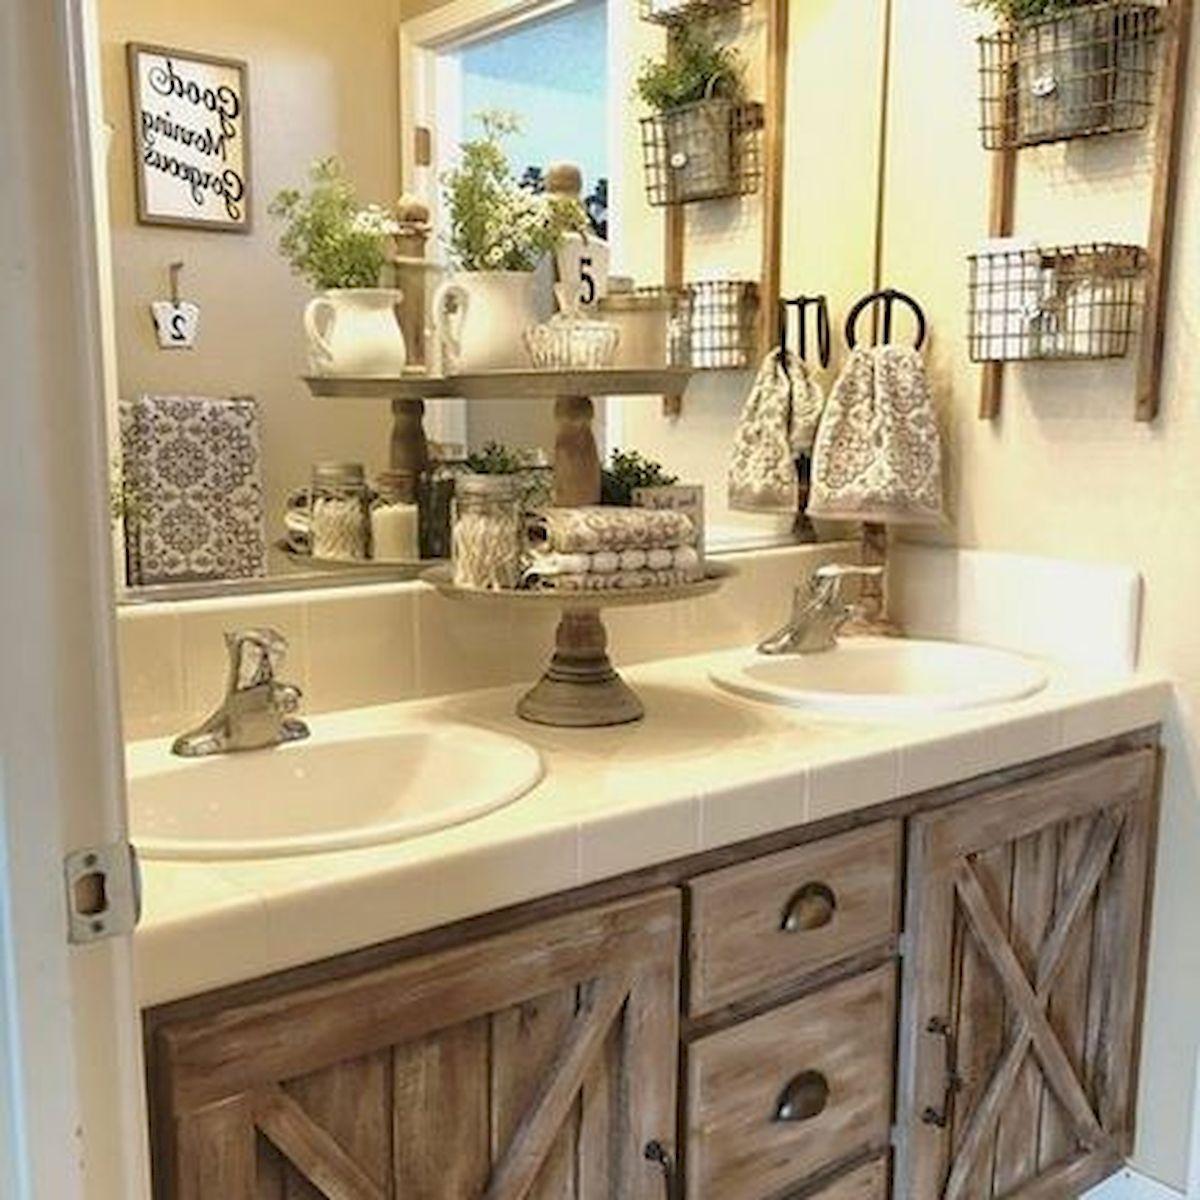 60+ Awesome Bathroom Decor and Design Ideas (60)